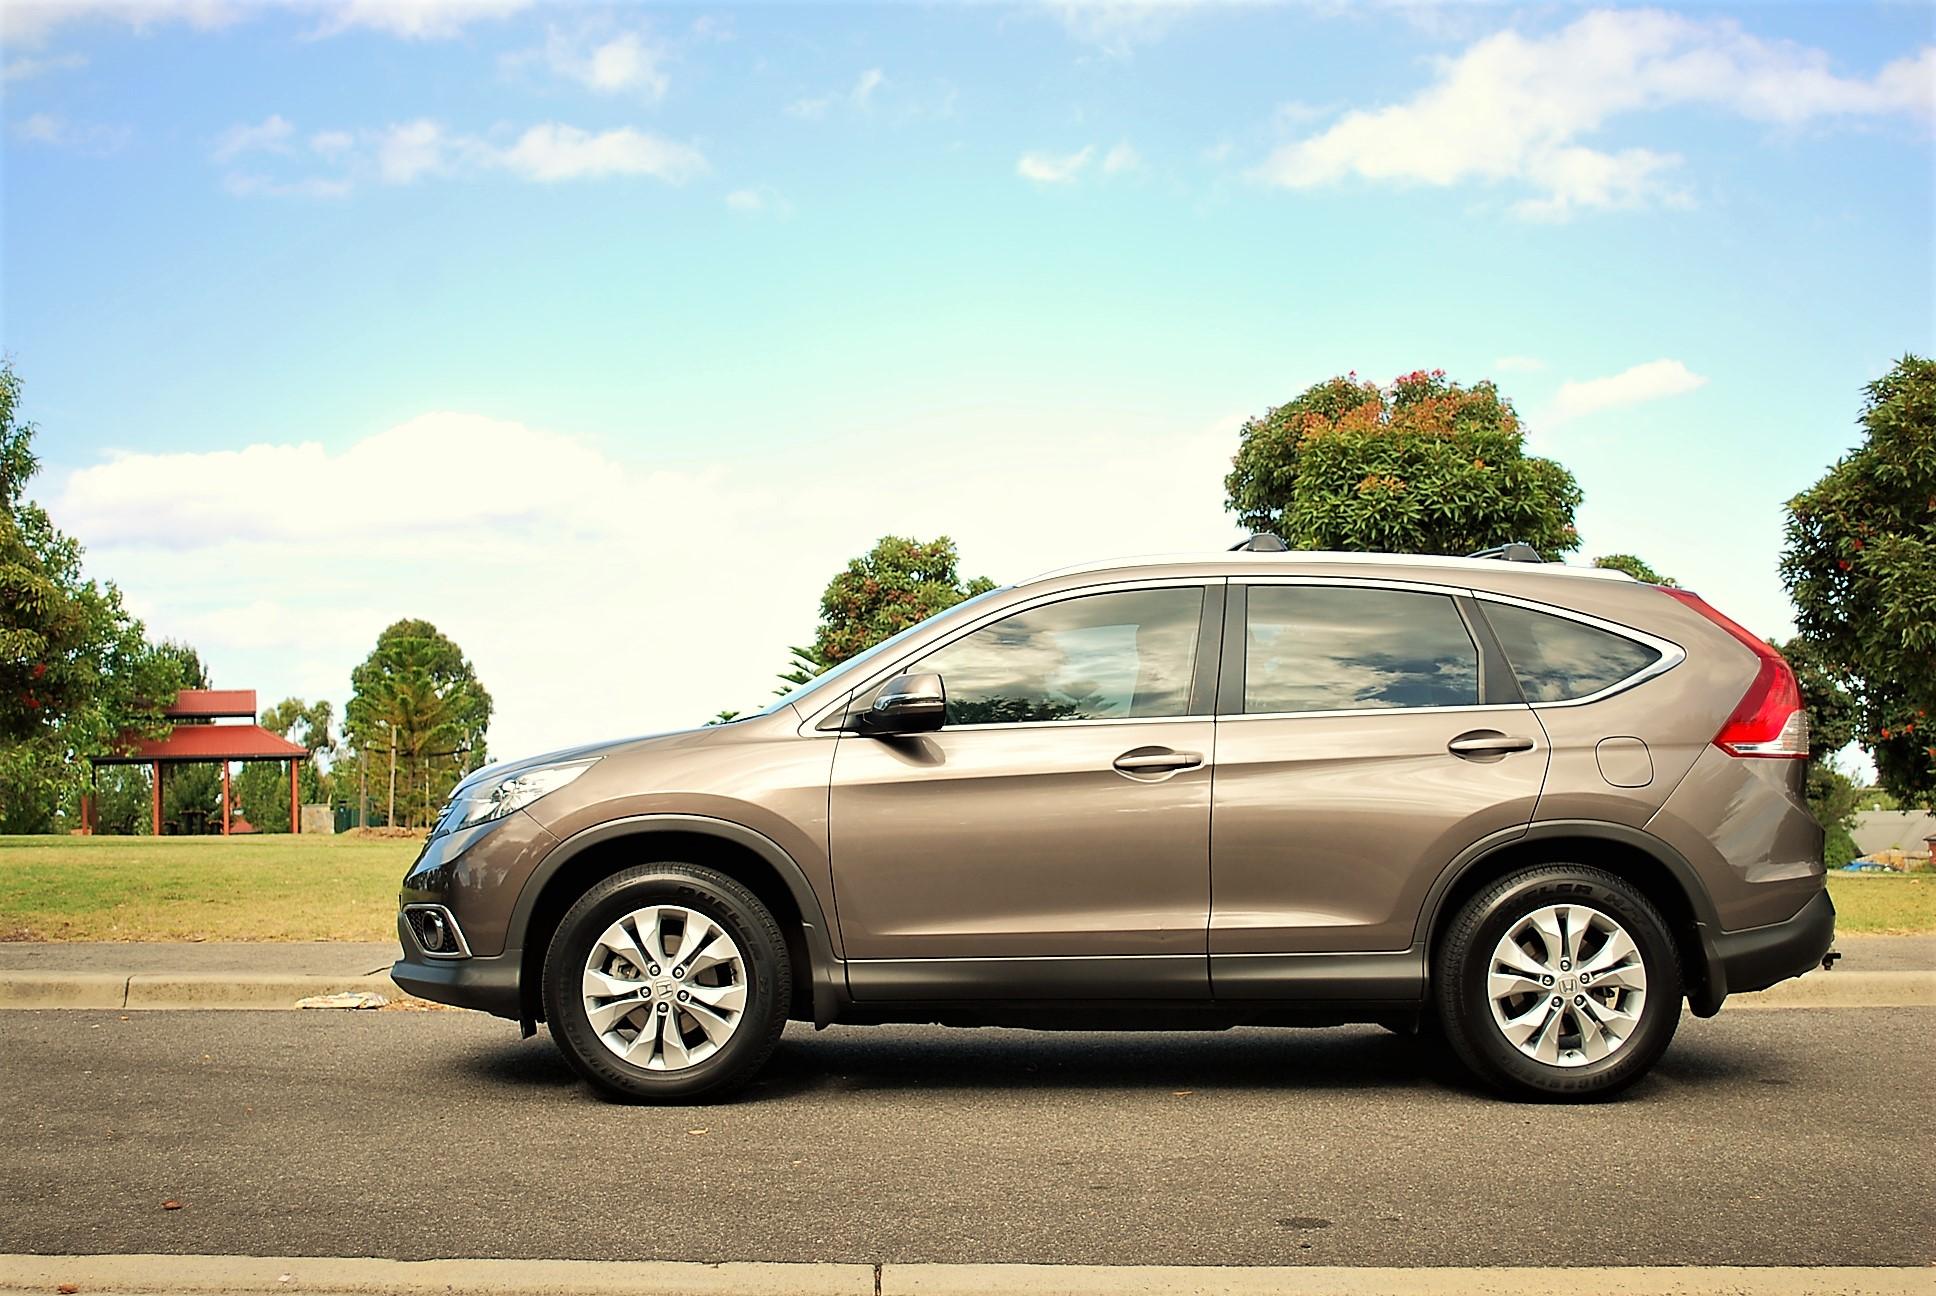 Used Car Appraisal >> 2013 Honda CR-V VTi-S 4WD – Find Me Cars